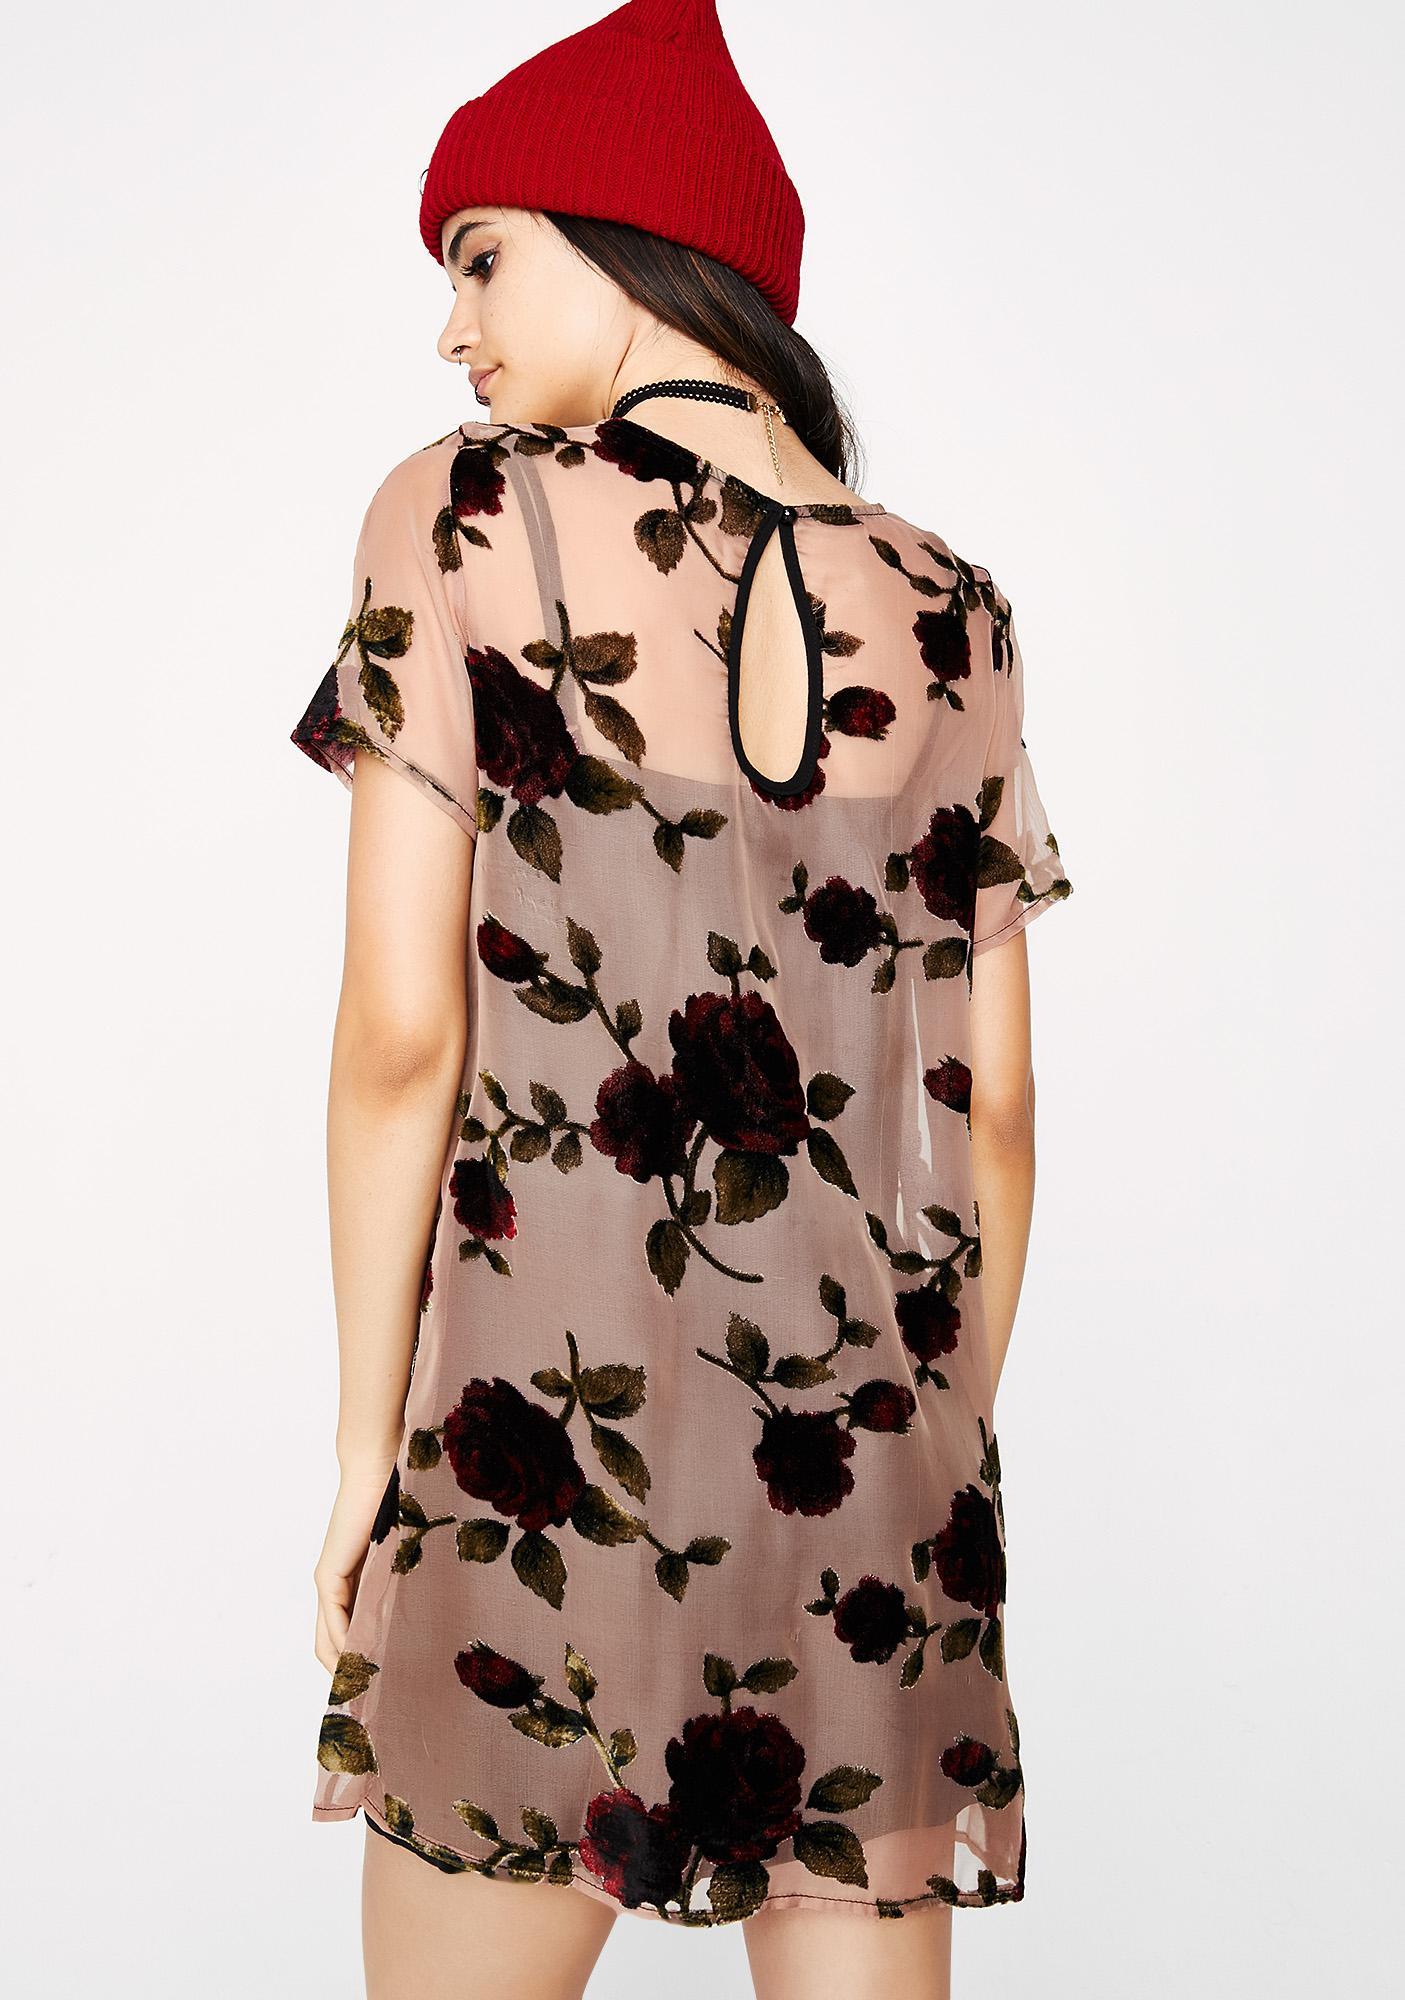 Bloomin' Roses Dress